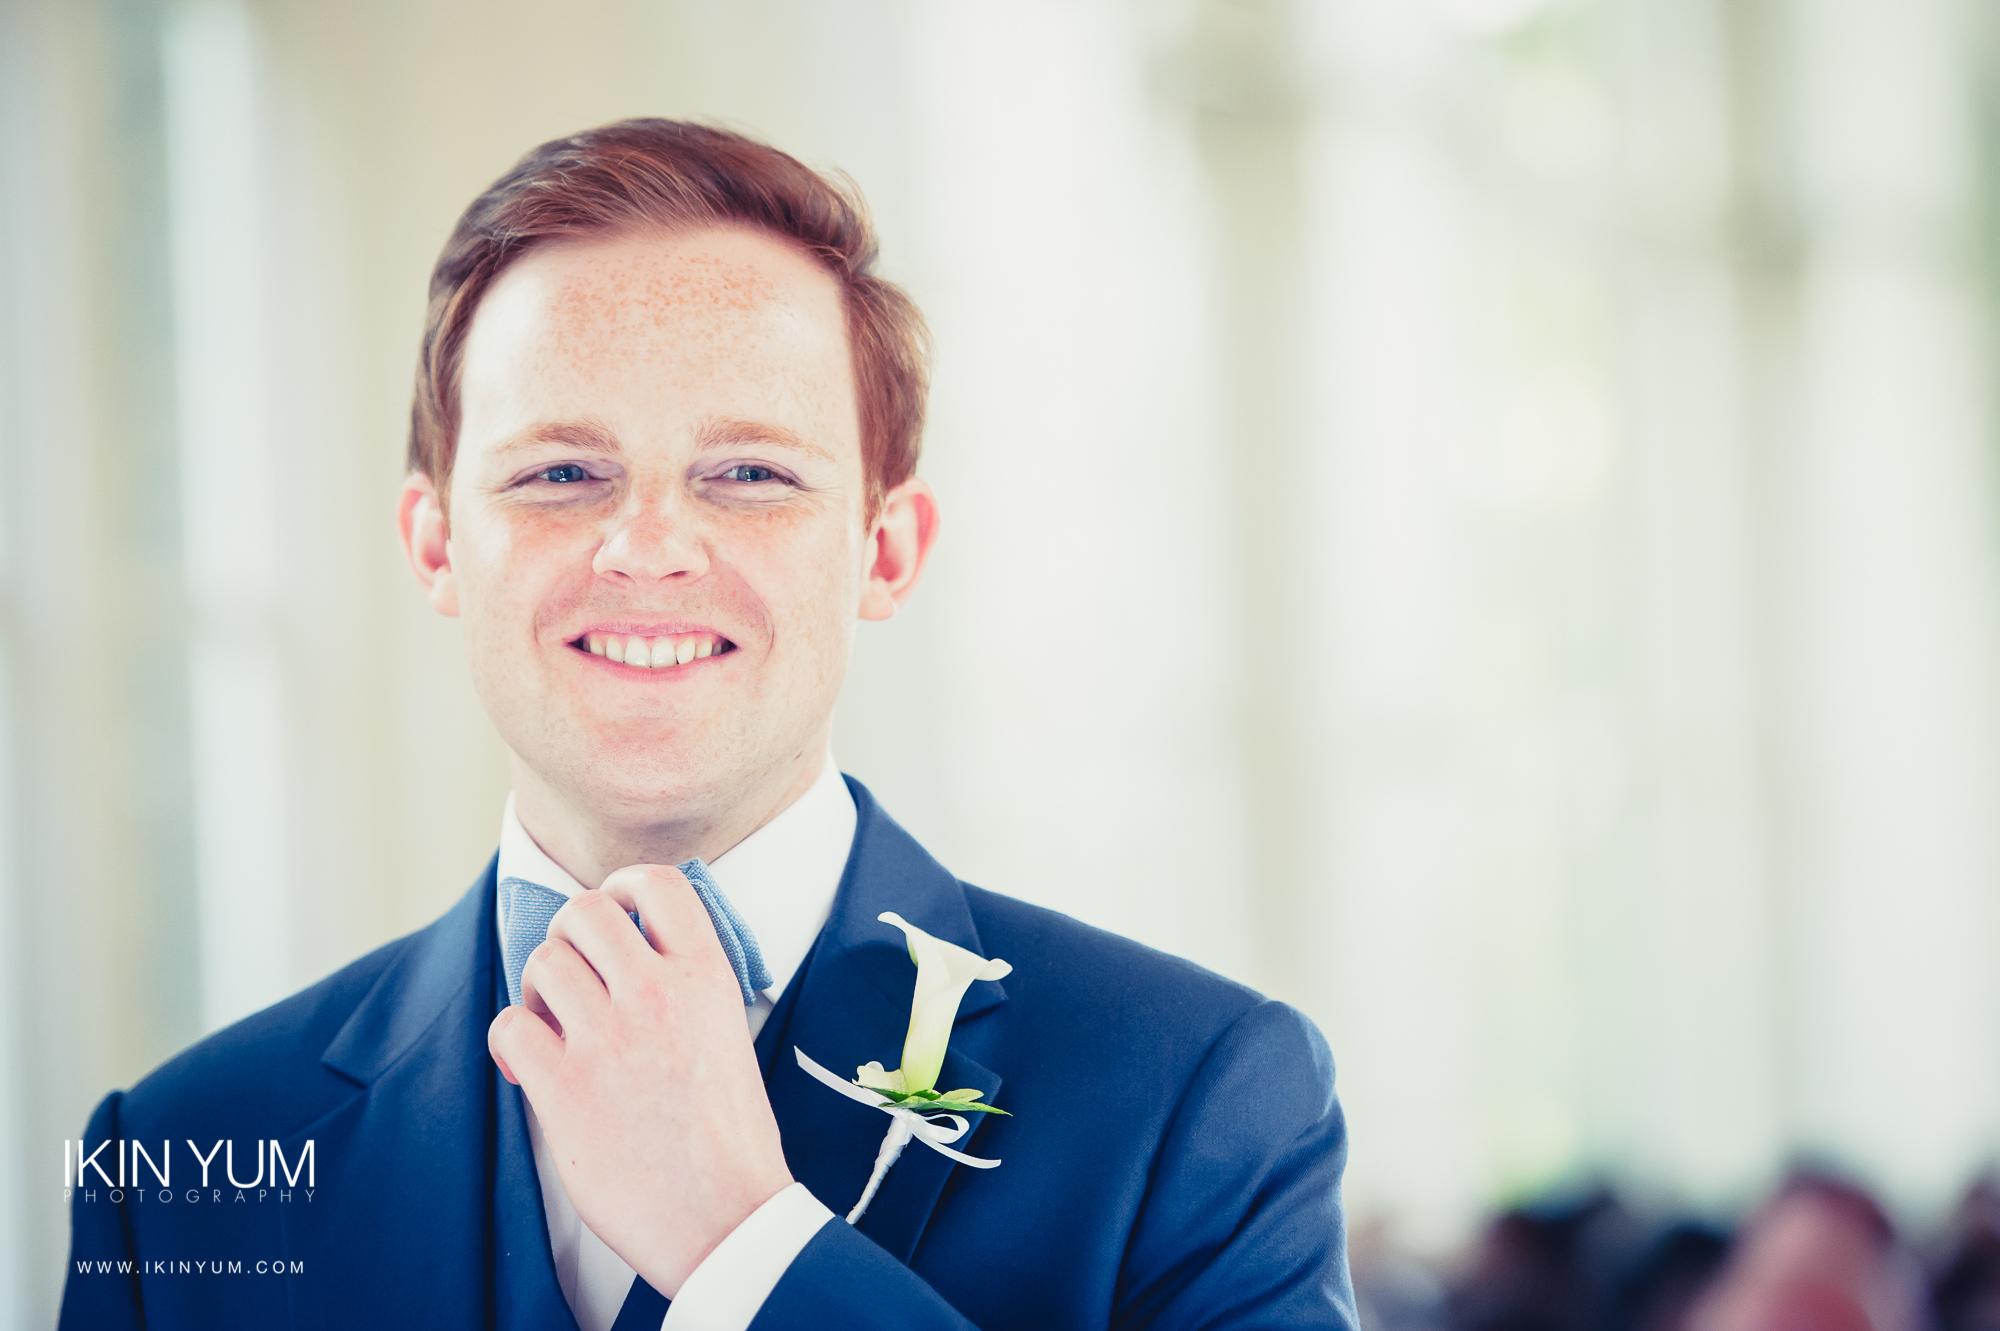 Holland Park Wedding - Ikin Yum Photography-0019.jpg